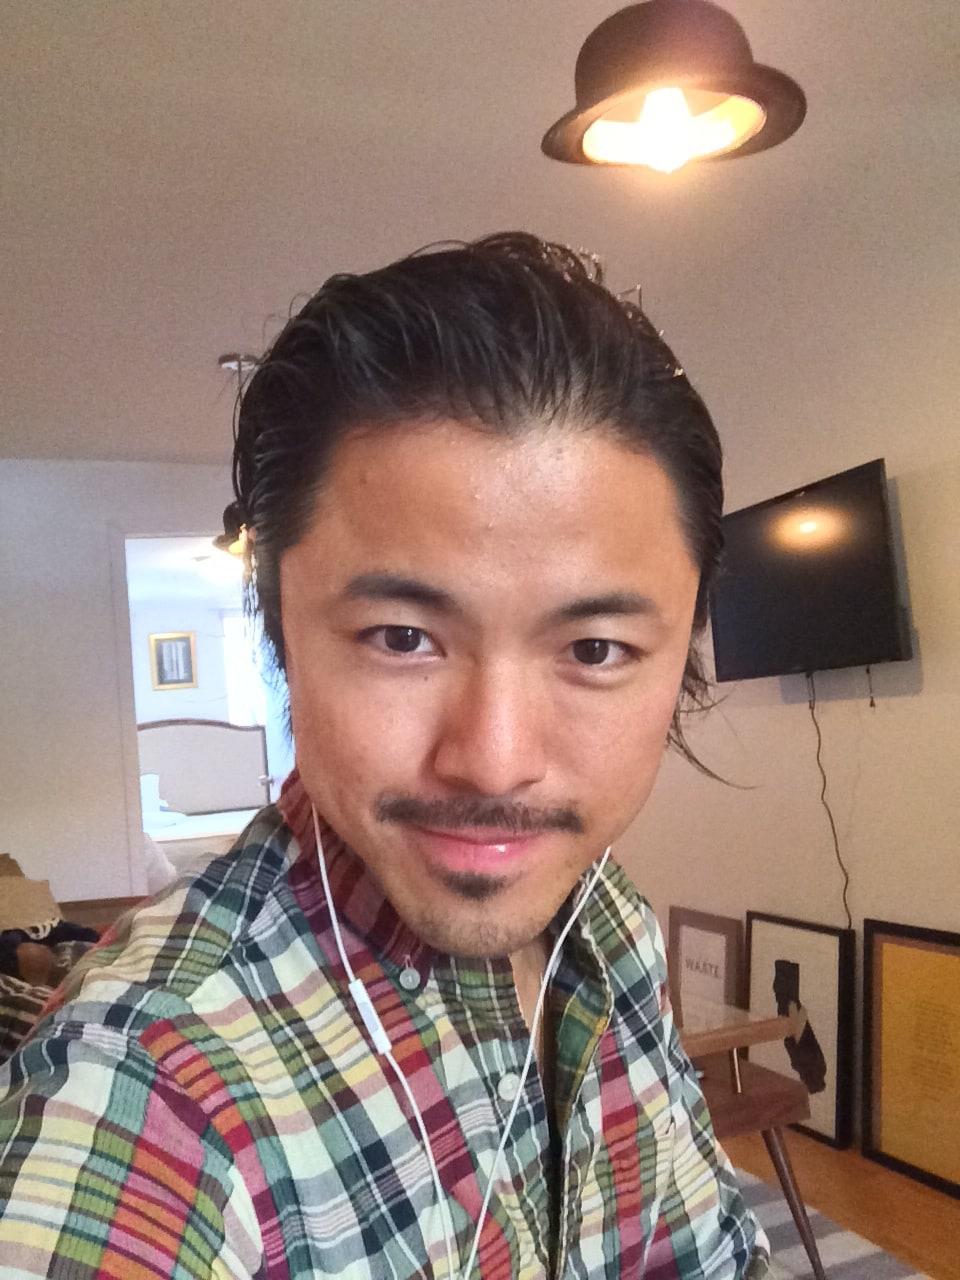 Kyosuke from New York